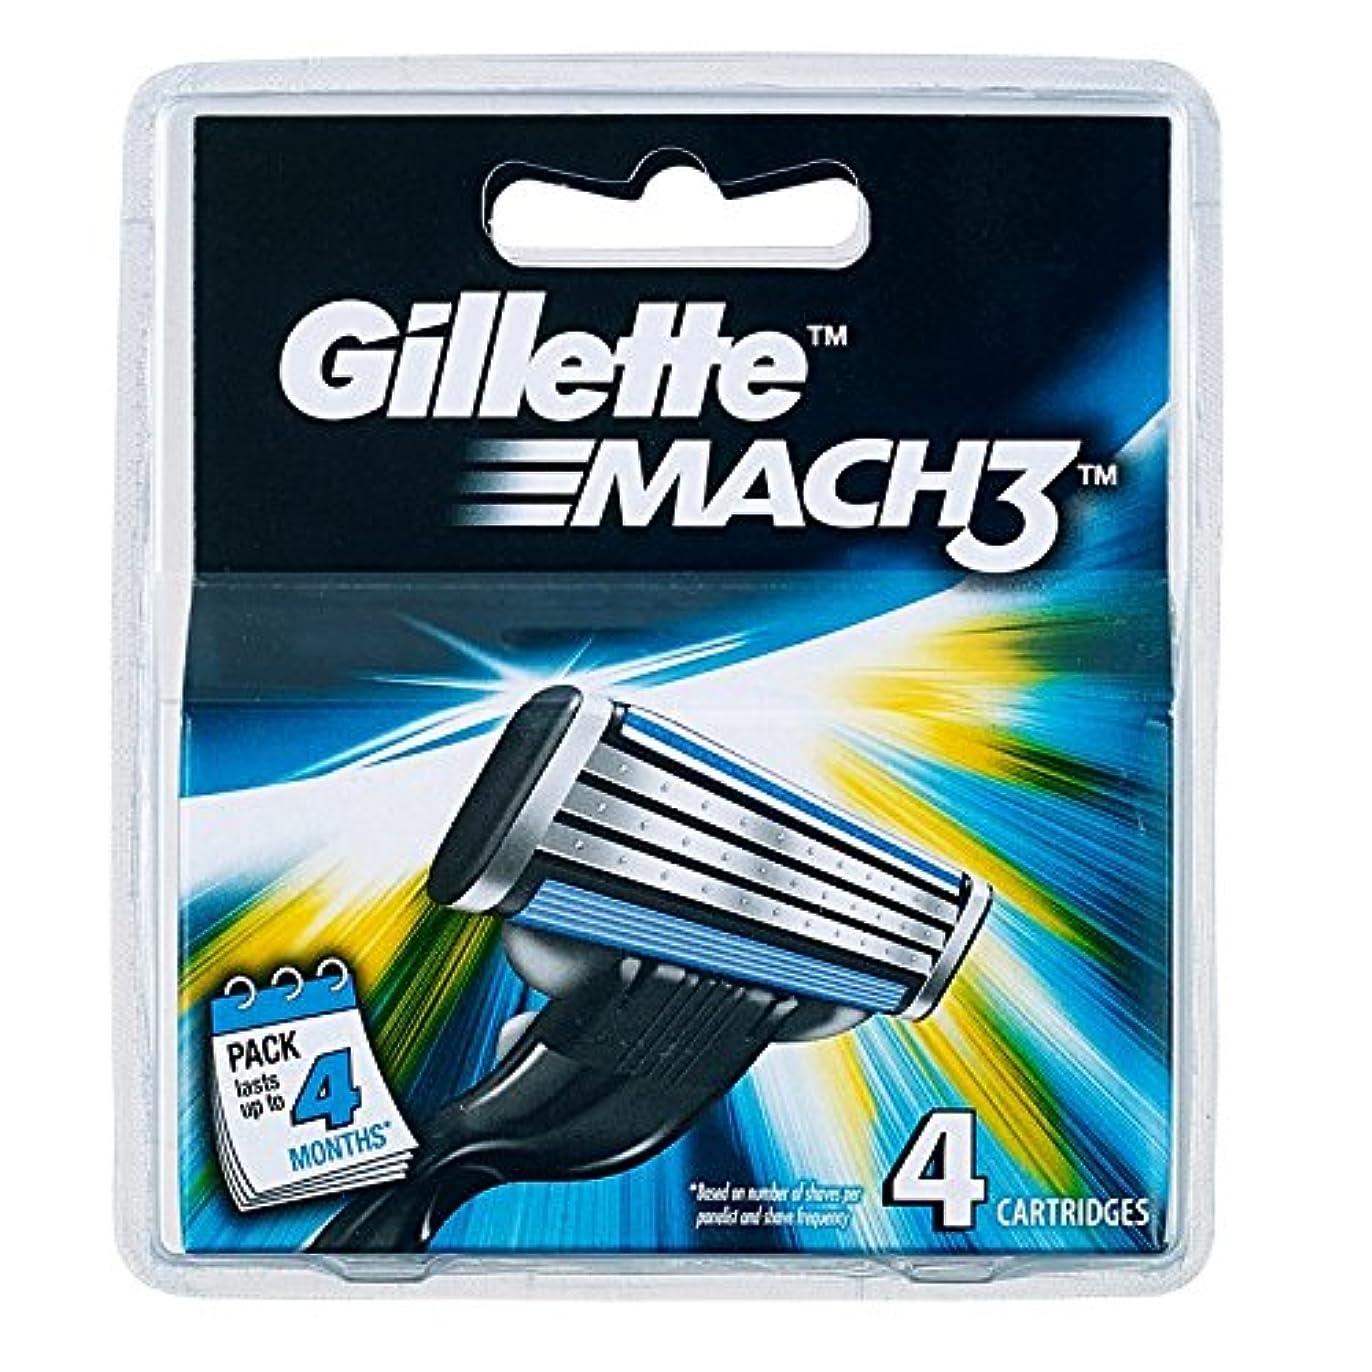 化合物平野昇進Gillette MACH3 SHAVING RAZOR CARTRIDGES BLADES 4 Pack [並行輸入品]